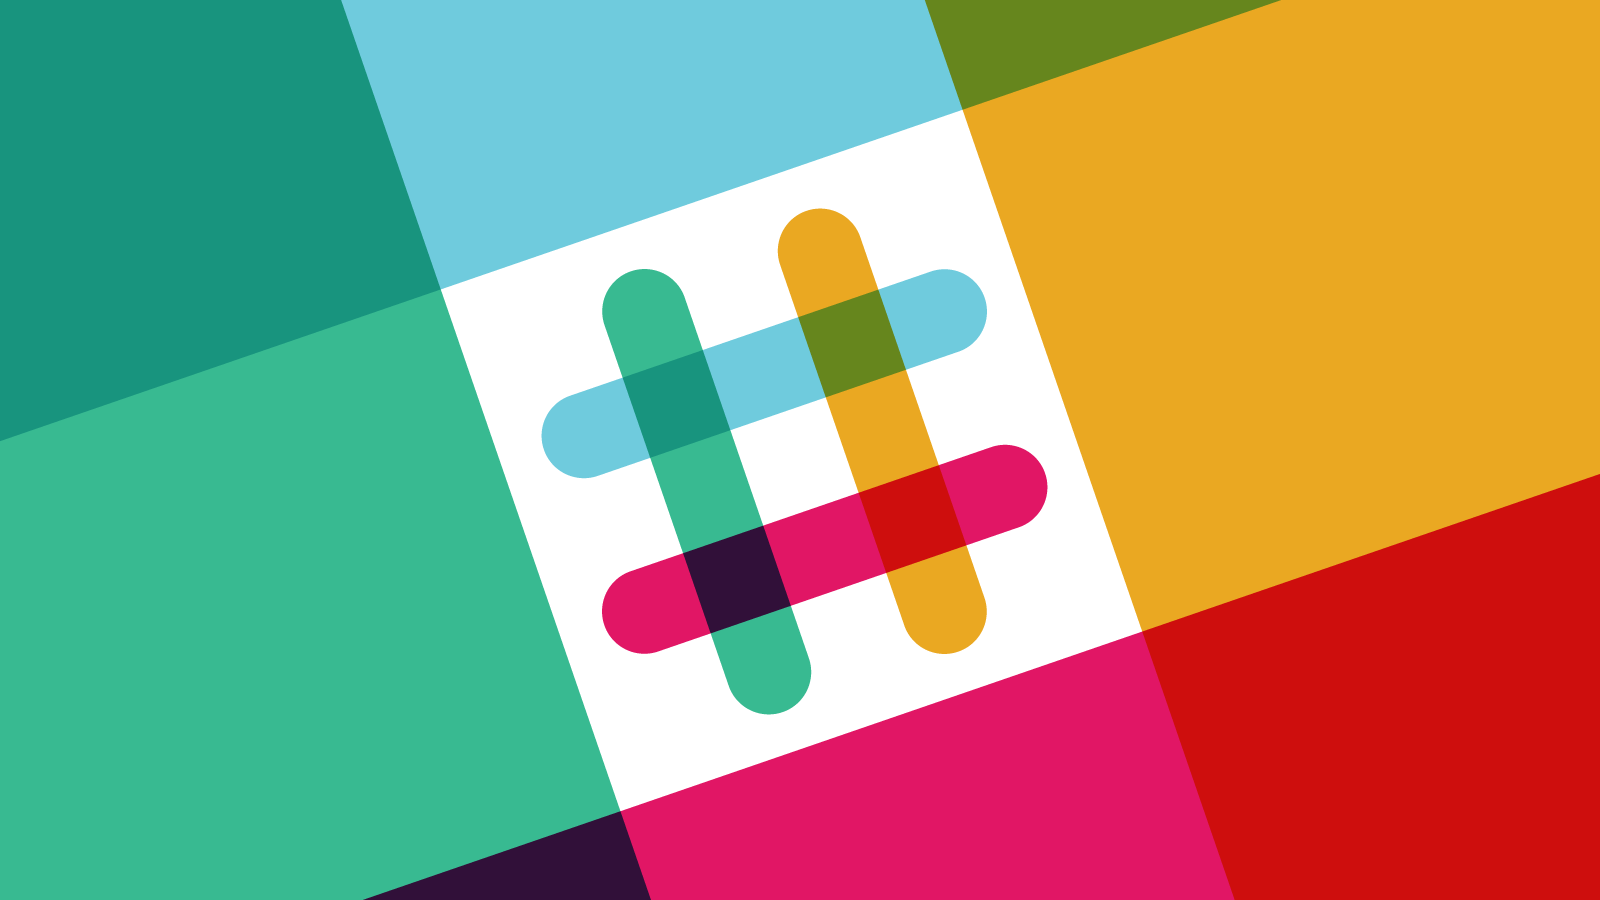 Code sharing - experimenting tools